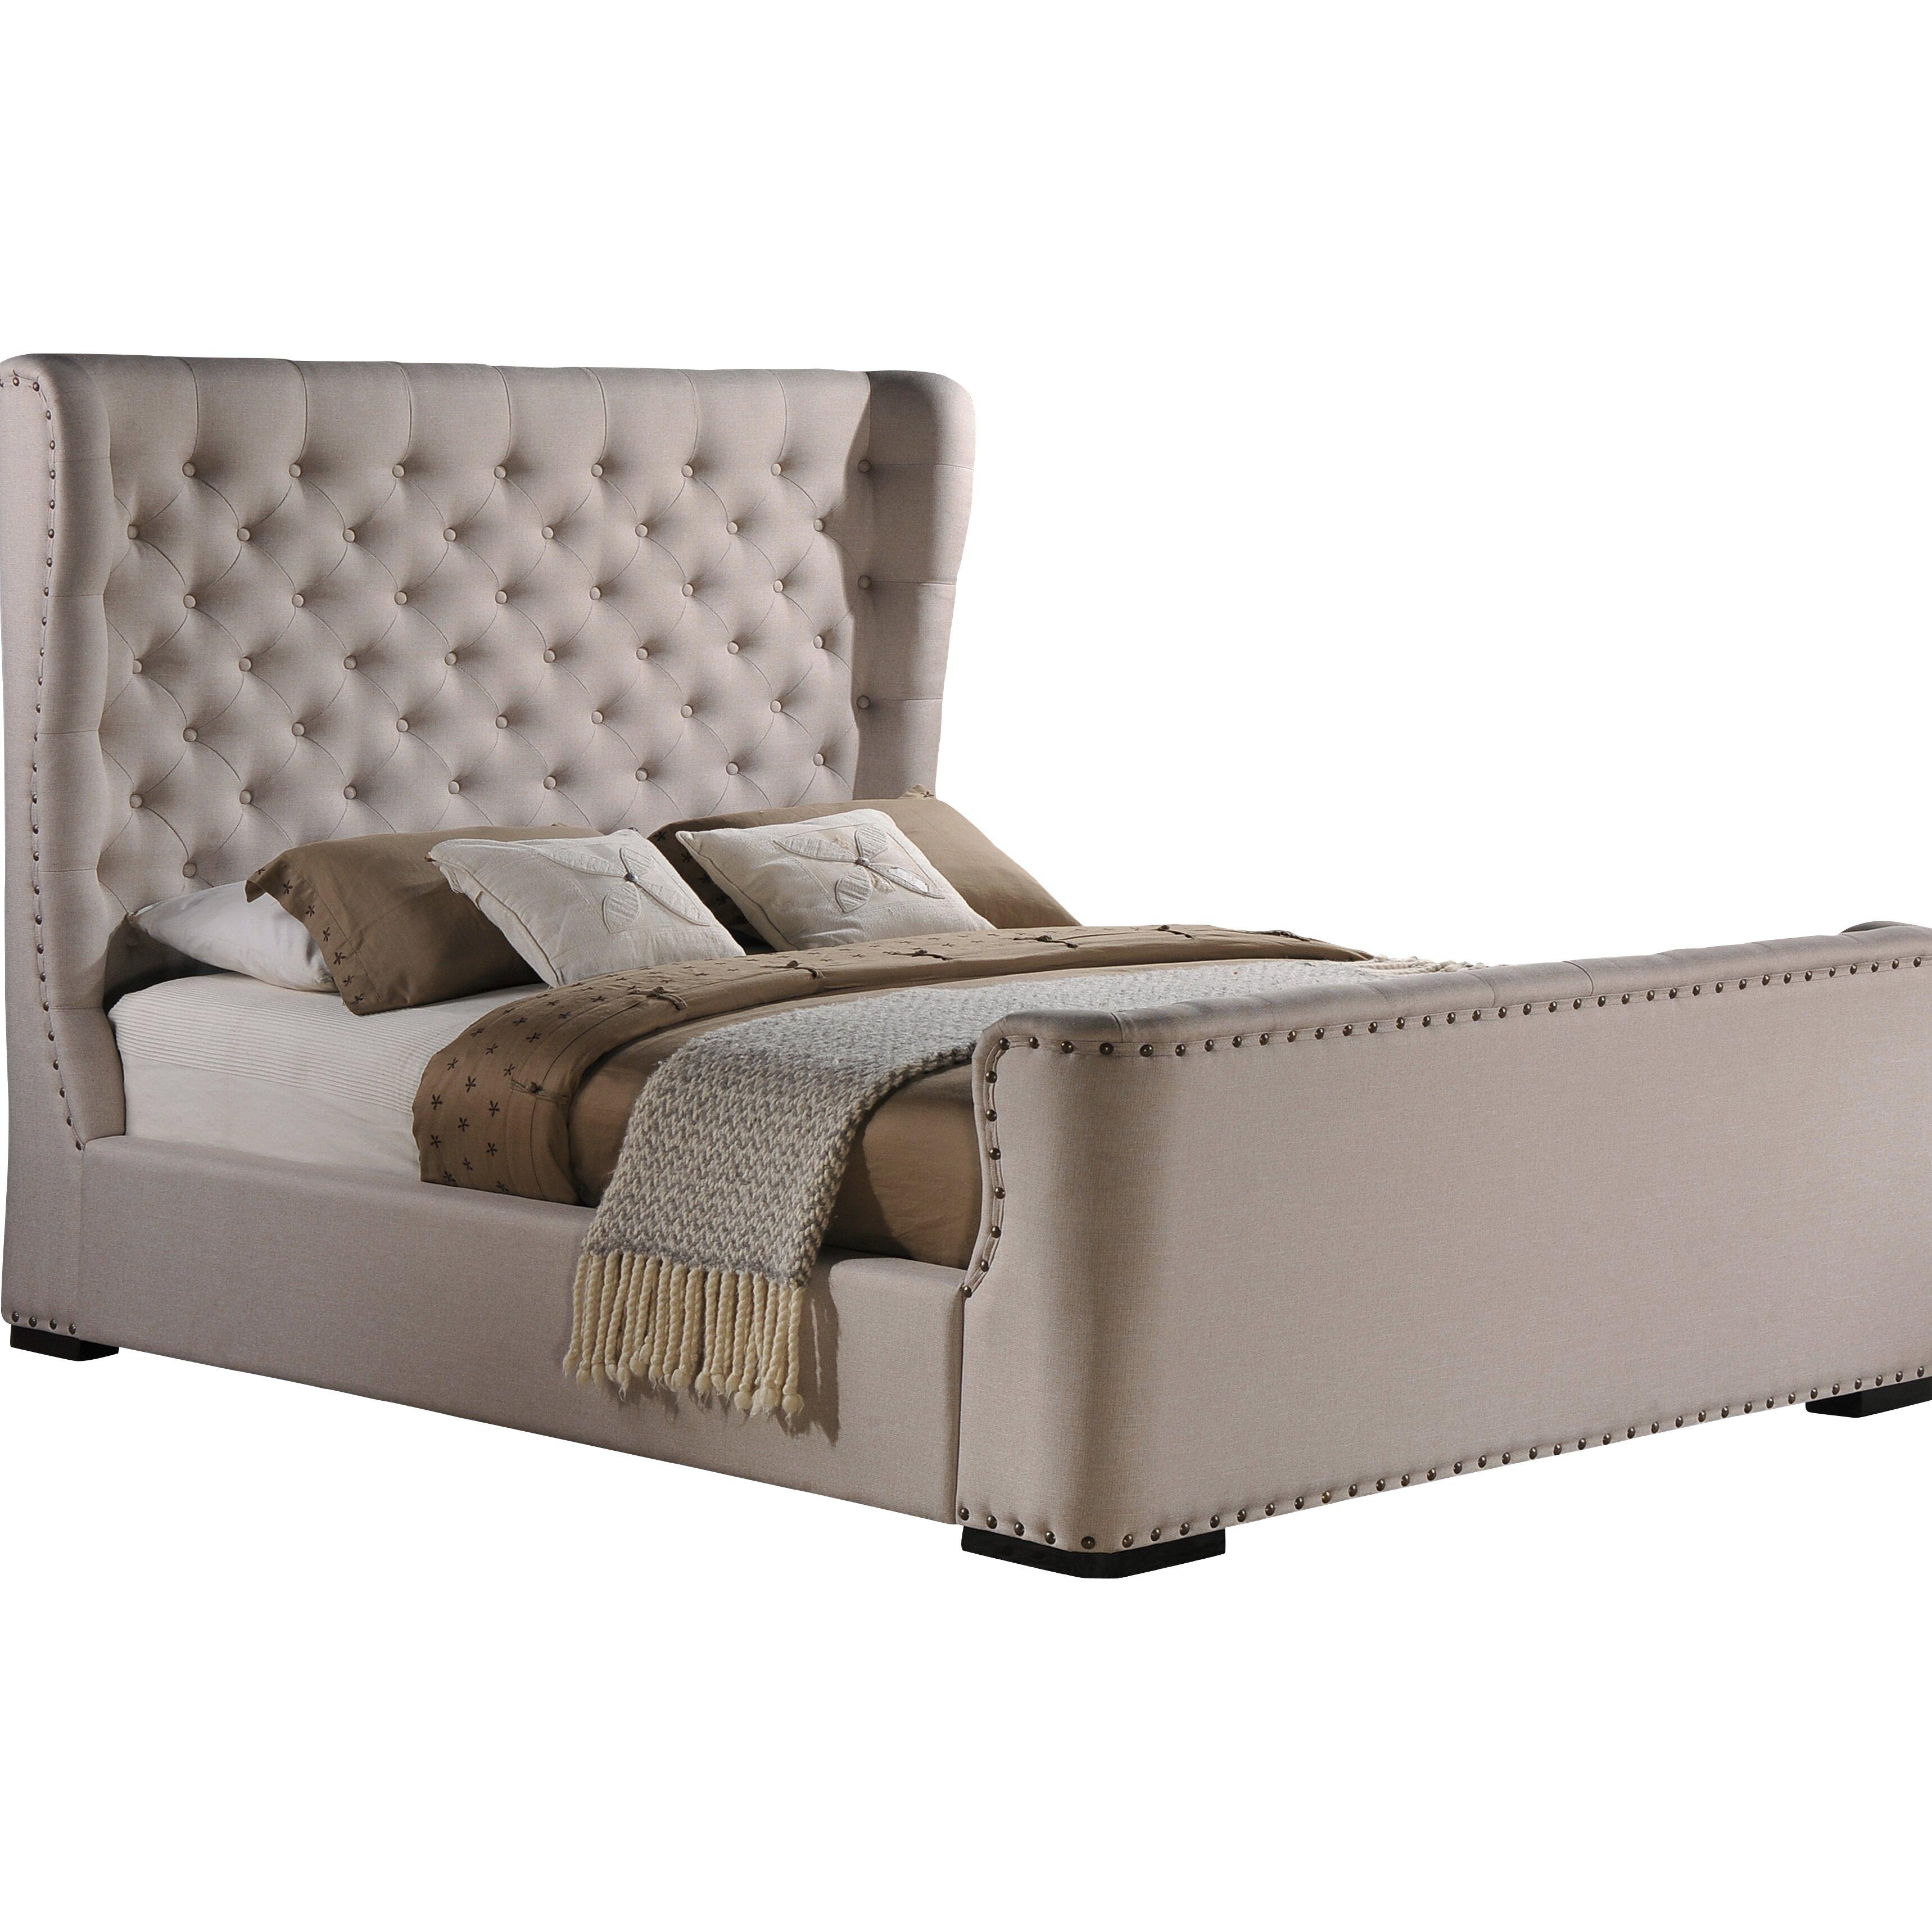 Wholesale Interiors Baxton Studio Queen Upholstered Platform Bed Reviews